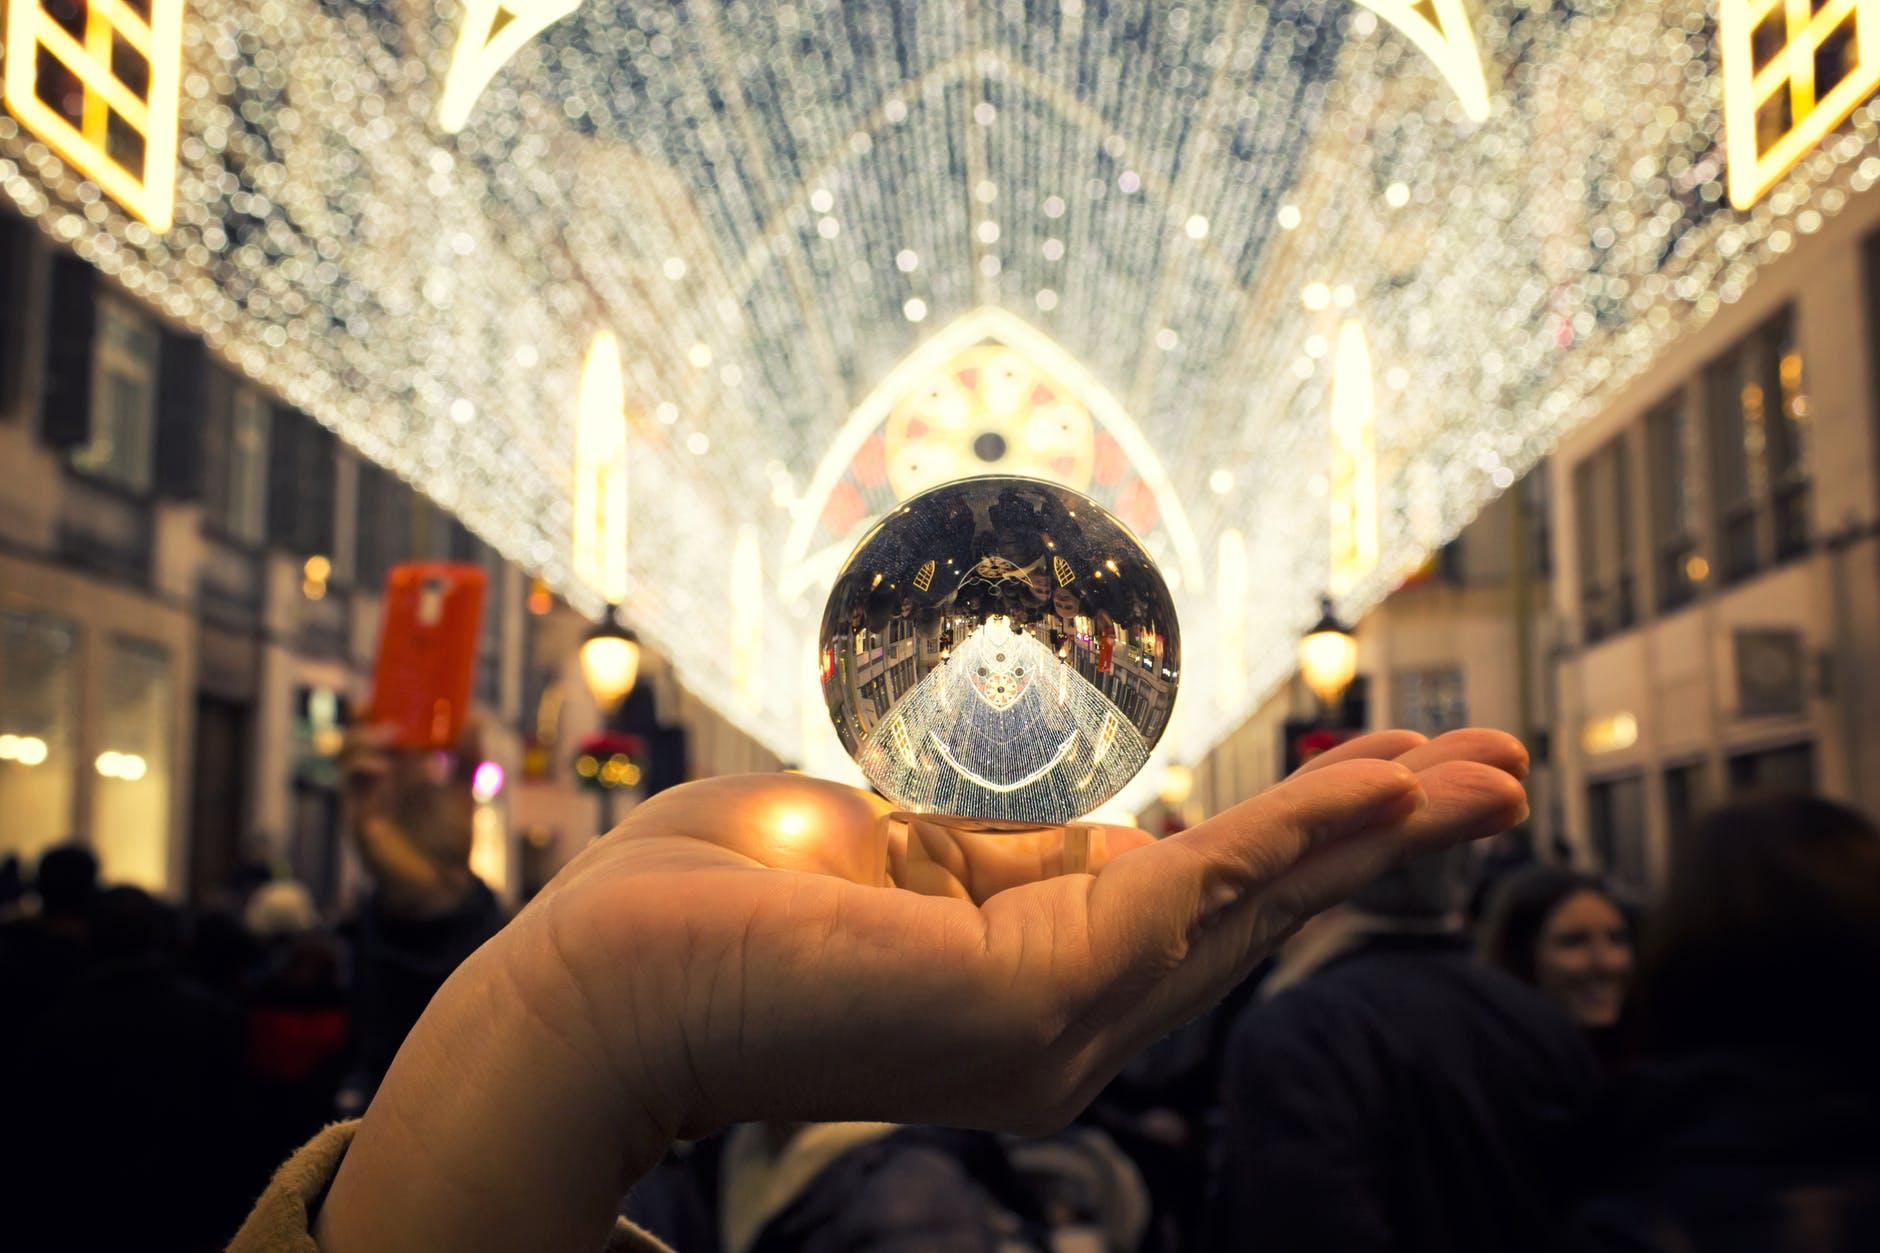 person holding round silver colored accessory